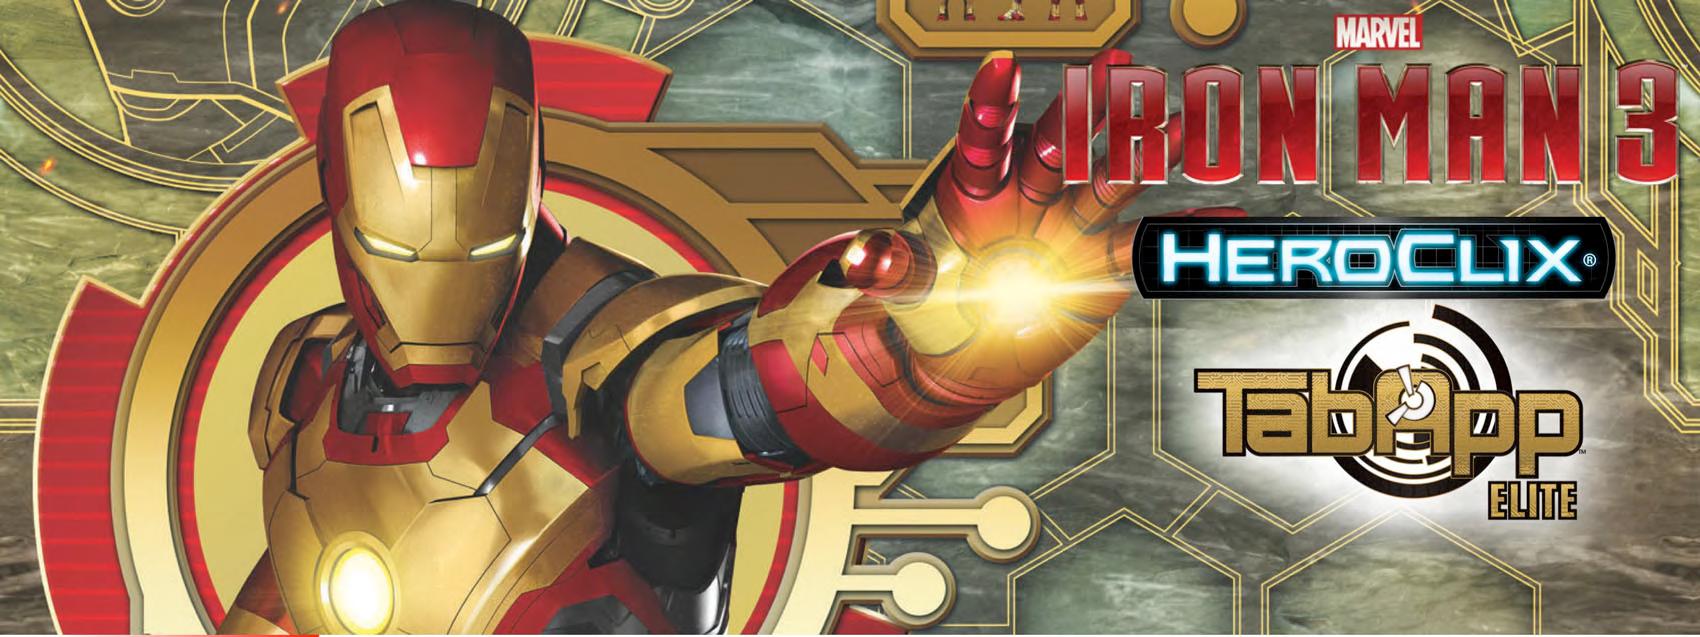 iron-man-3-heroclix-tab-app